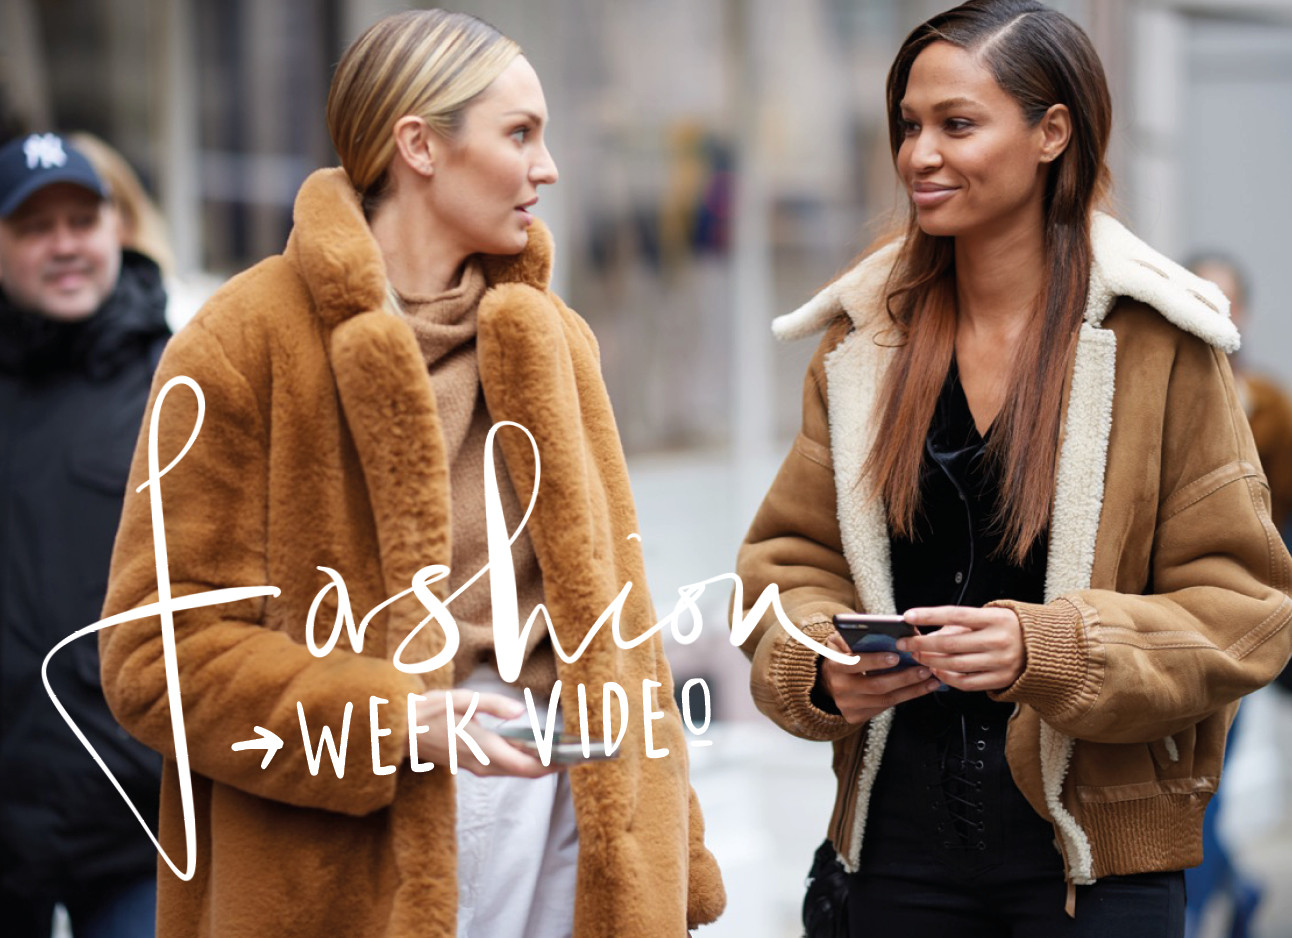 Modellen praten op straat tijdens fashionweek New York 2019